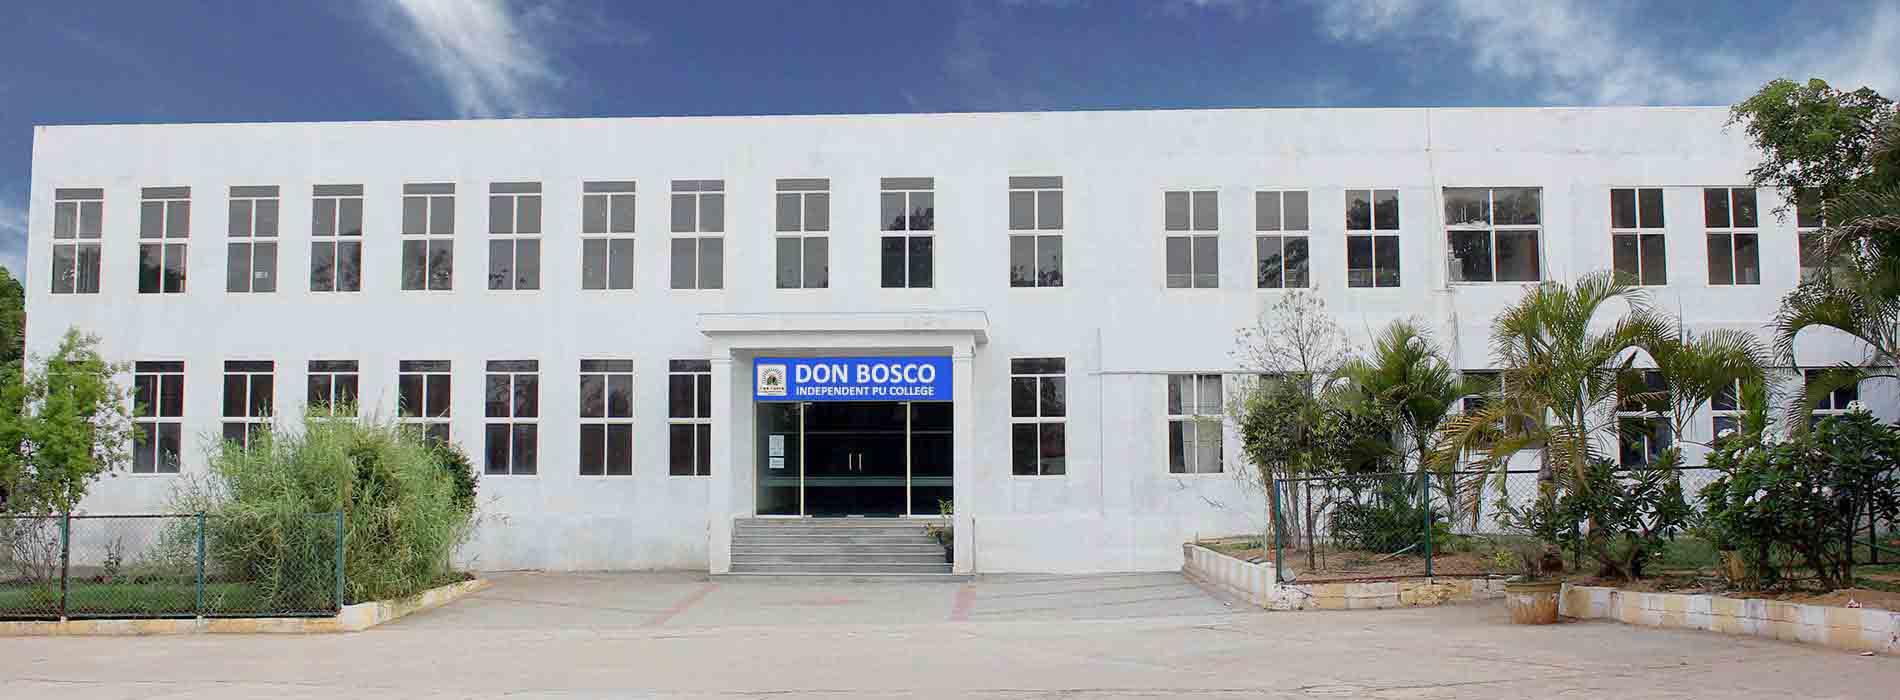 Collège Don Bosco: Best PU Colleges In Bangalore- DBIPUC Mysore Road Bangalore